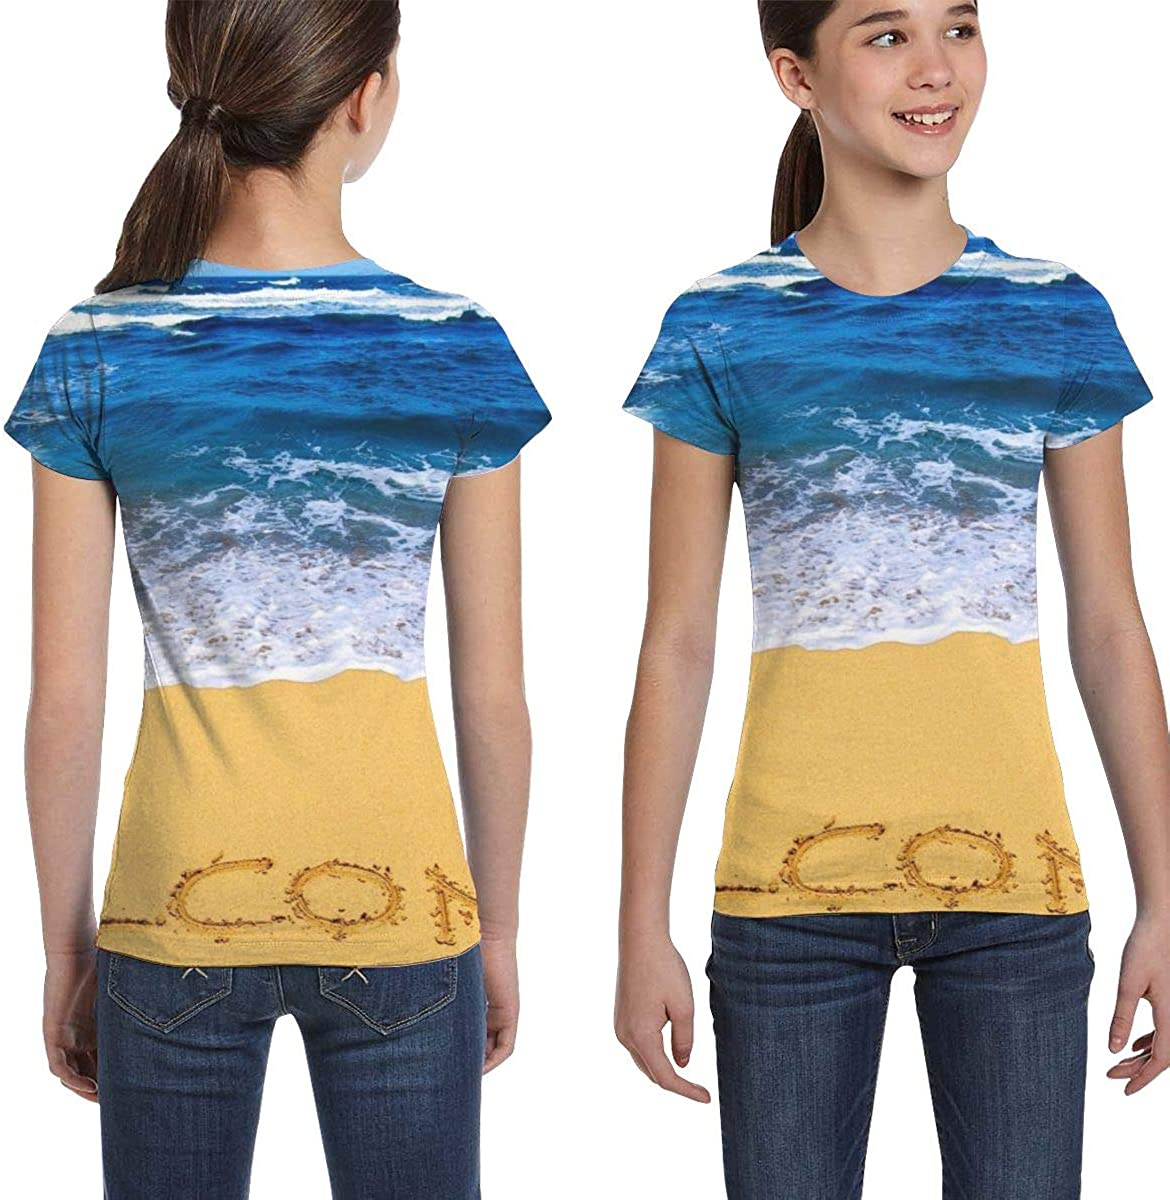 Fashion Tunic Shirt Dress XS-XL L6Nv4o@A Girls Short Sleeve Beach Theme Welcome T-Shirts